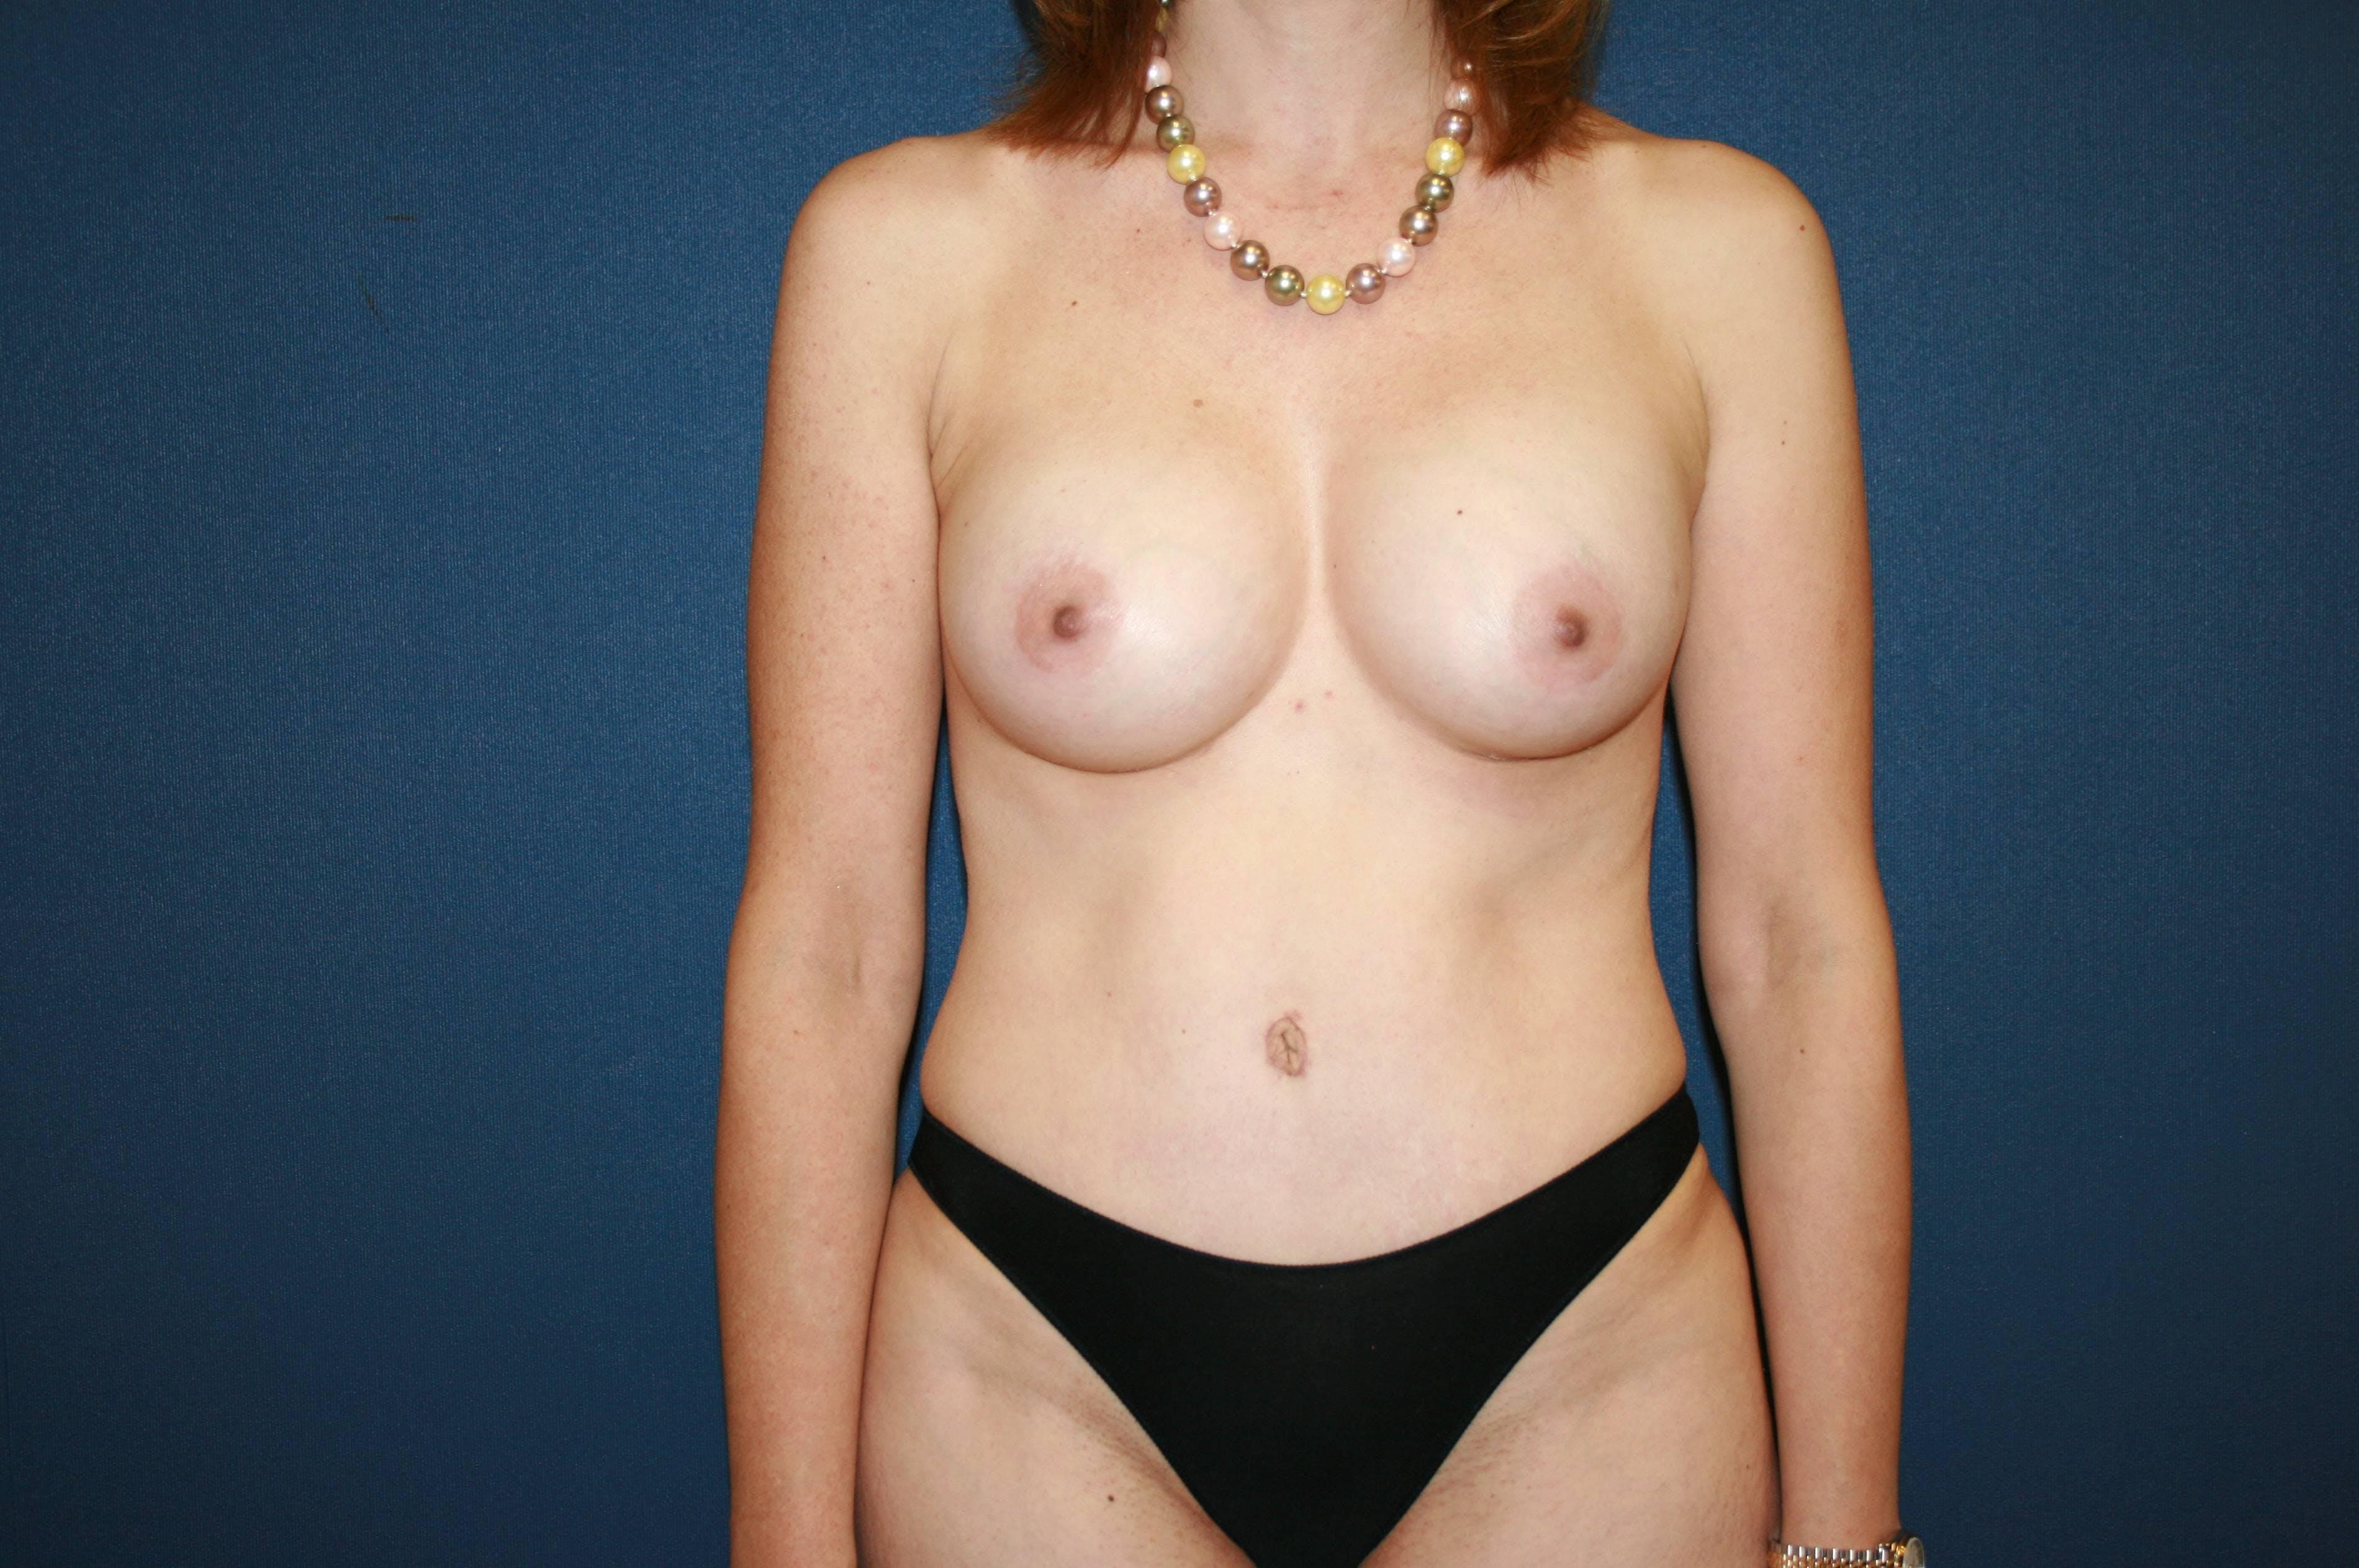 Tummy Tuck (Abdominoplasty) Gallery - Patient 4448620 - Image 2